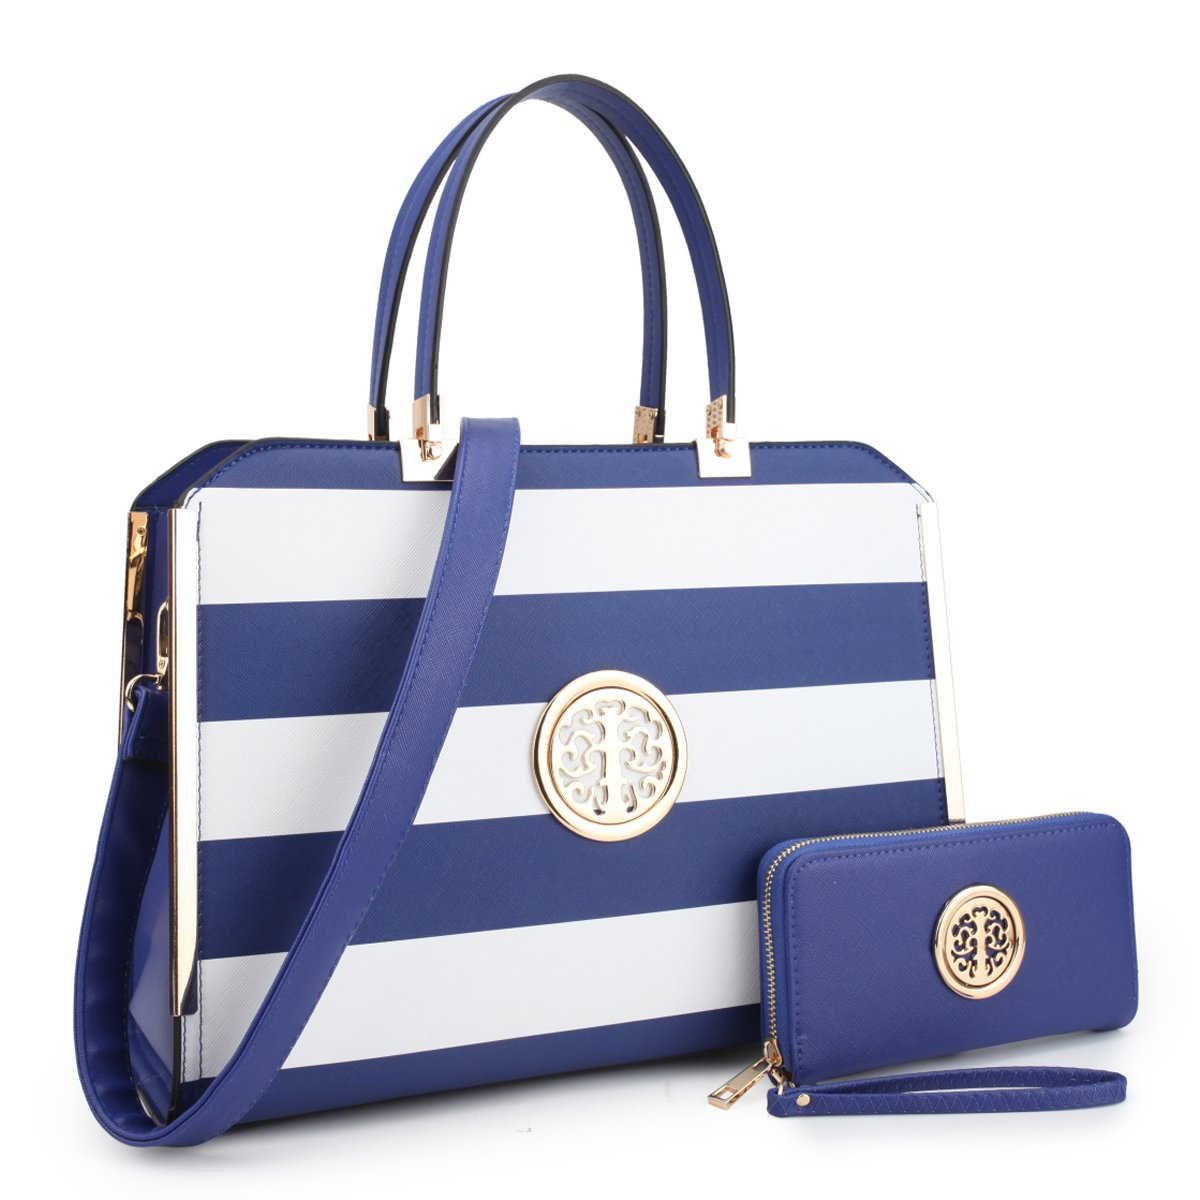 "Women Large Designer Handbags Satchel Purses Structured Briefcase Shoulder Bags Work Bags for 13"" Laptop Tablet KC-XL-18-7555-W-BKF-NEW"